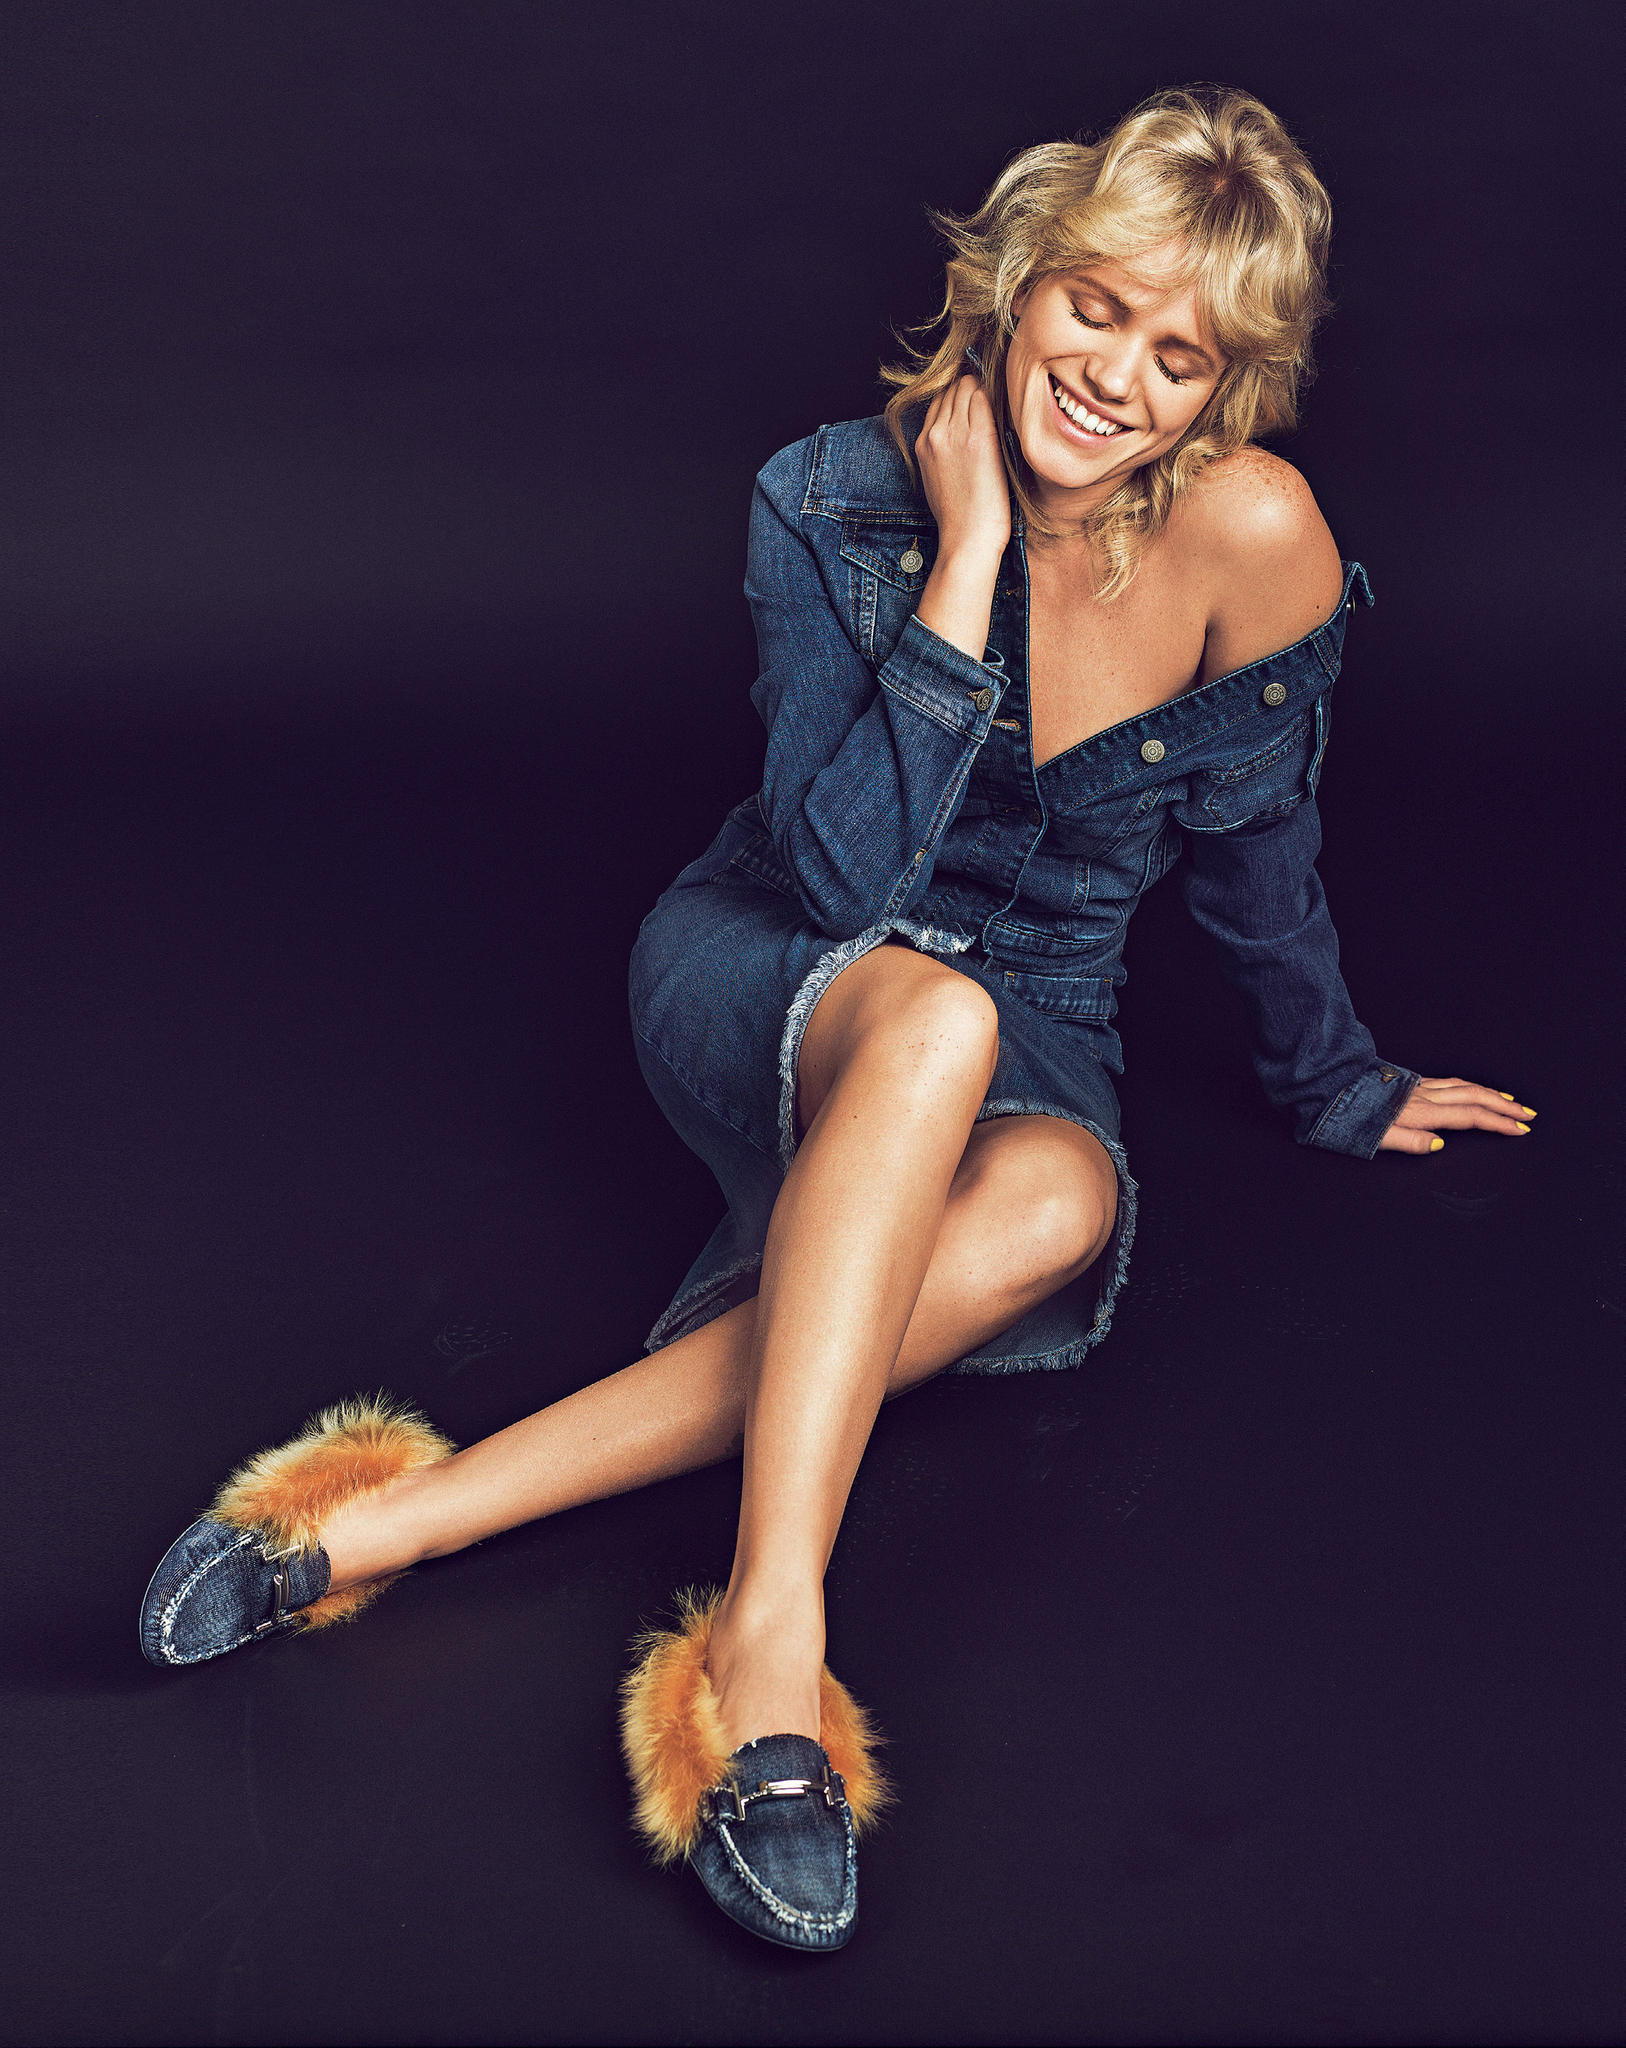 Jeans-Trends: Model